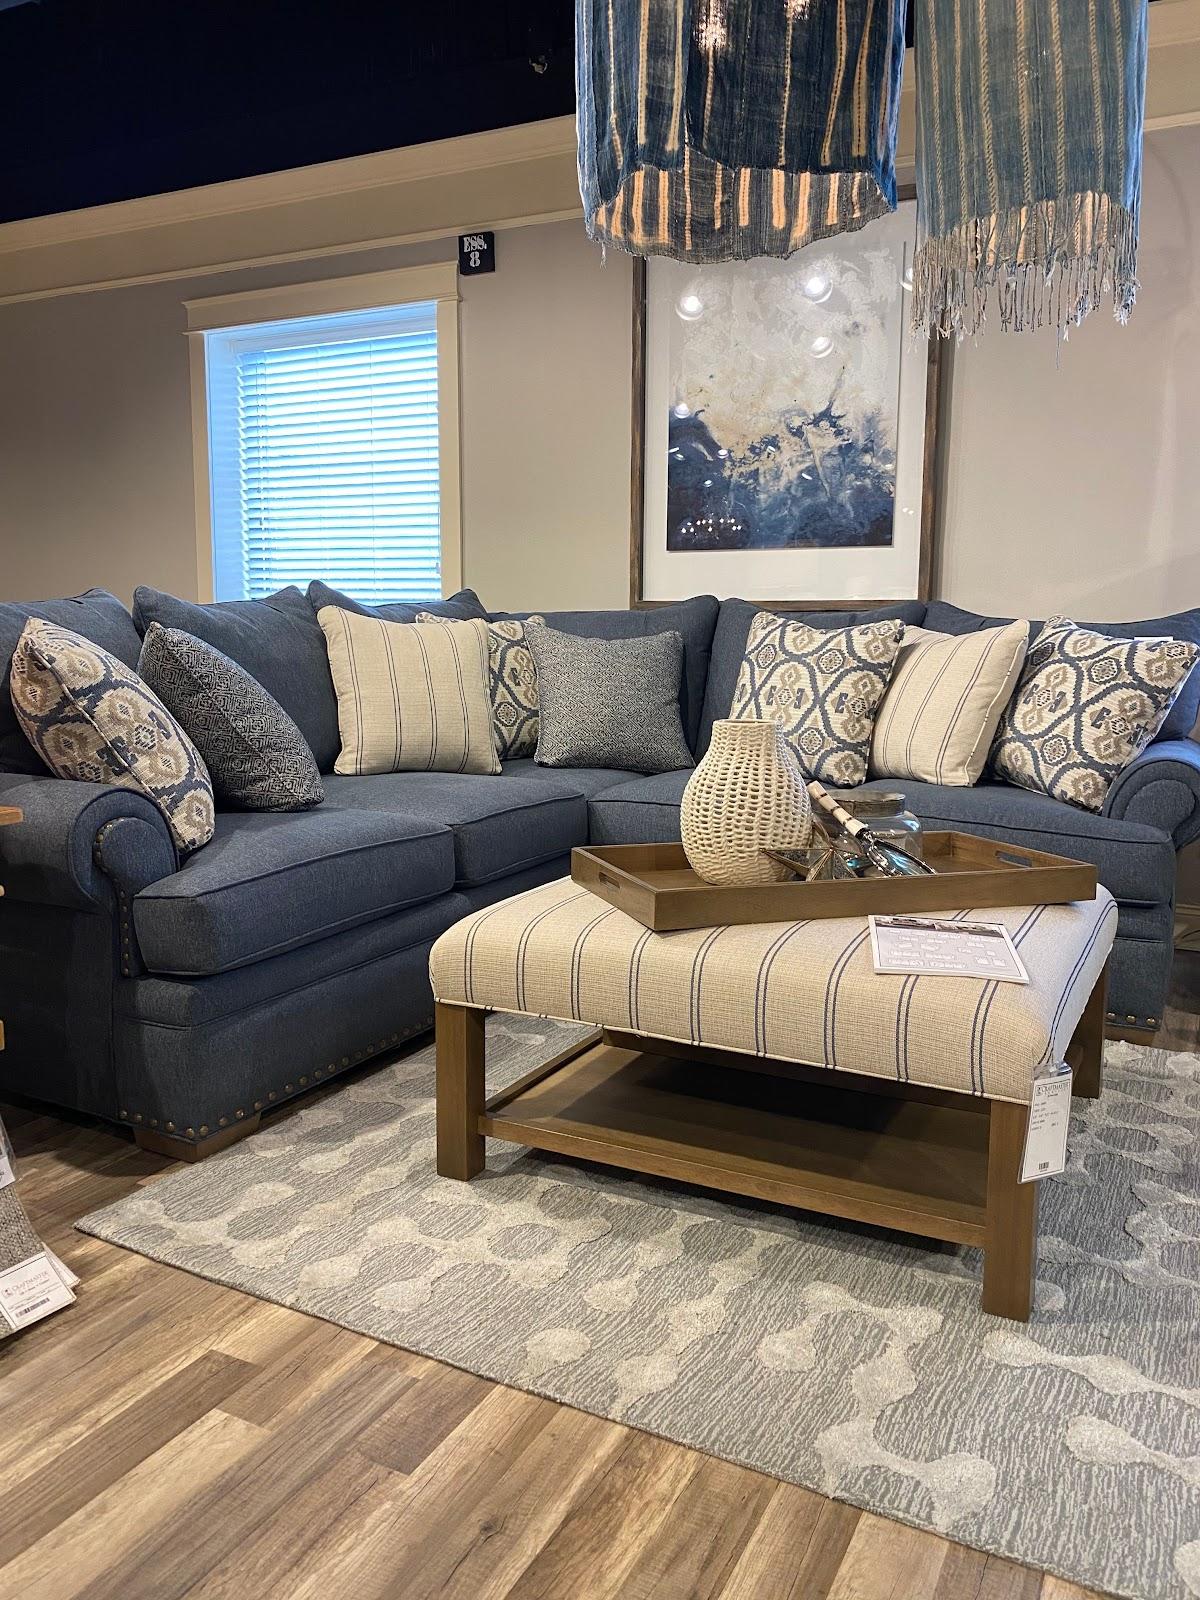 latest trends in interior design 2021 home decor soft fabric light fixtures